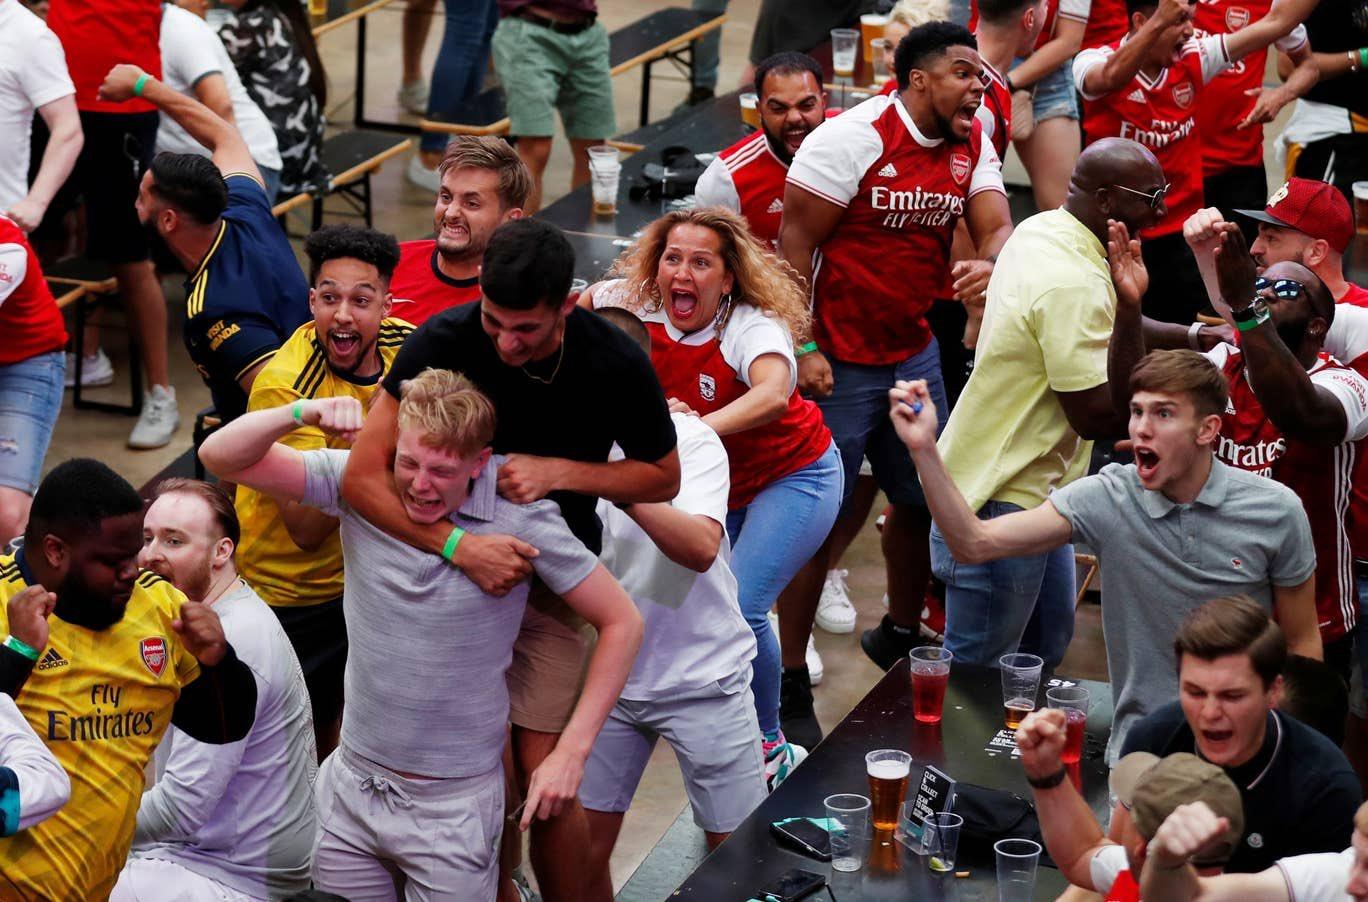 Arsenal se consagró campeón de la FA Cup de Inglaterra